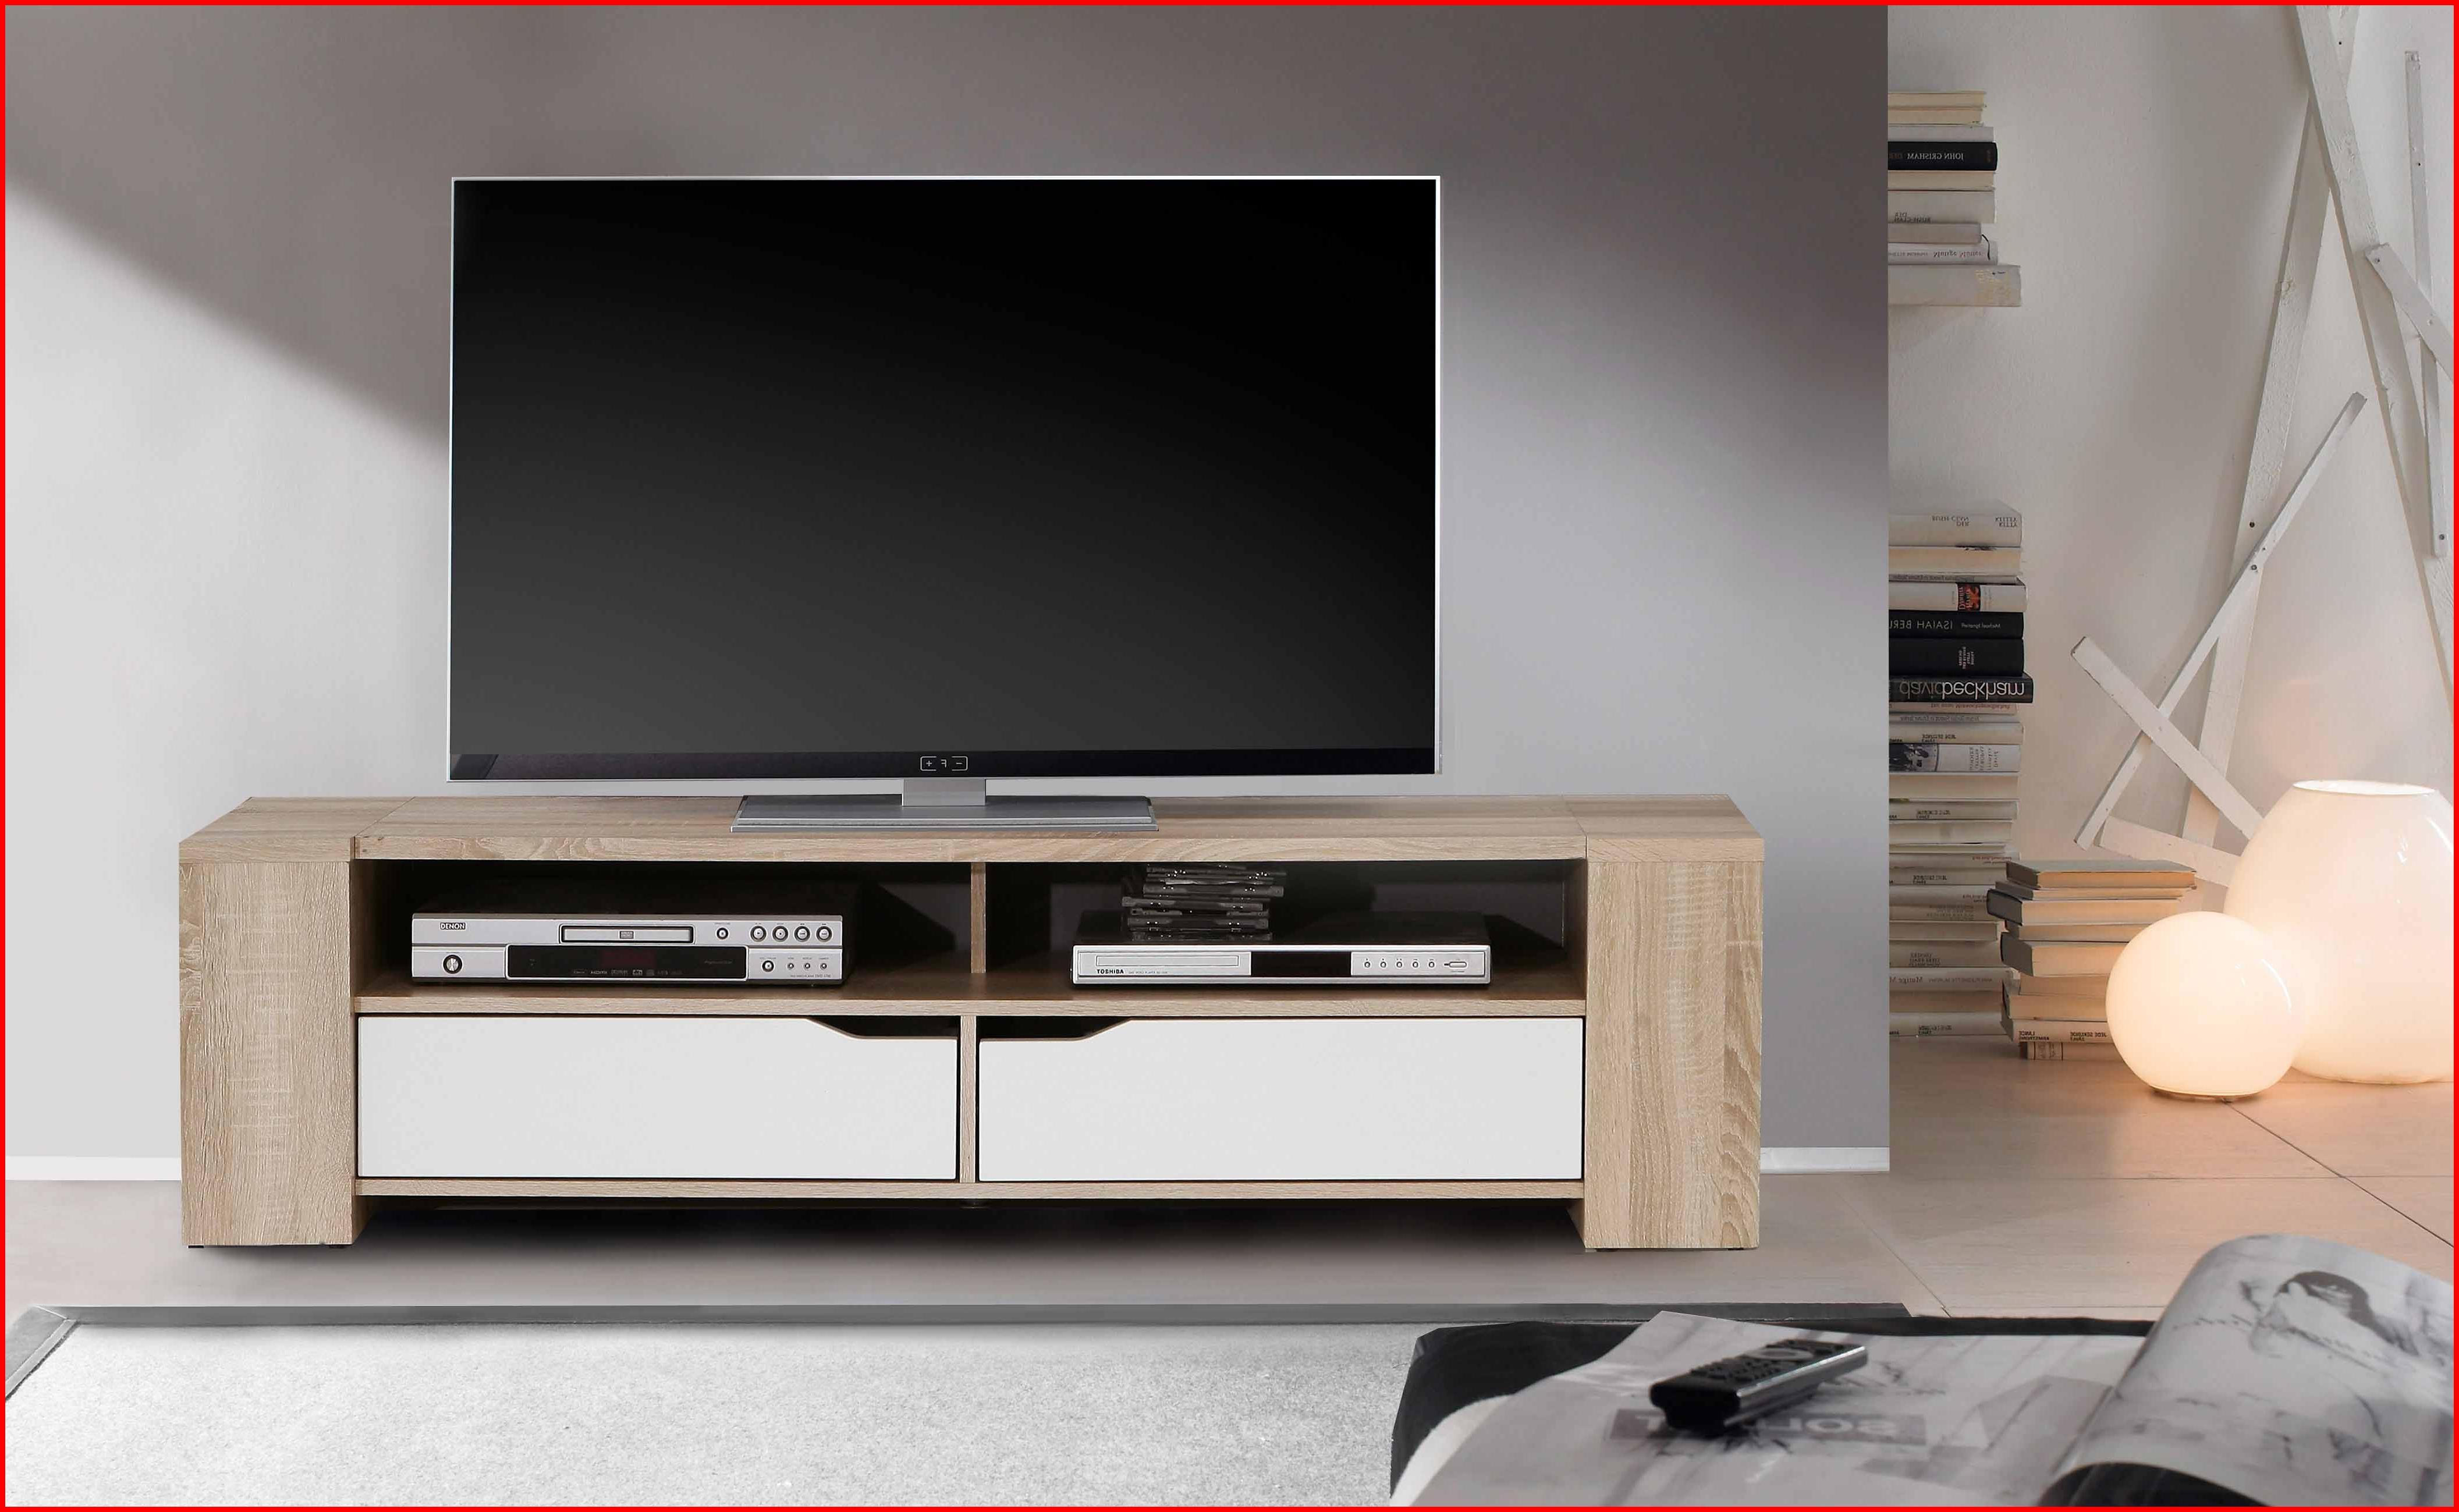 Muebles España X8d1 Muebles De Television Baratos Muebles Tv Modernos Baratos